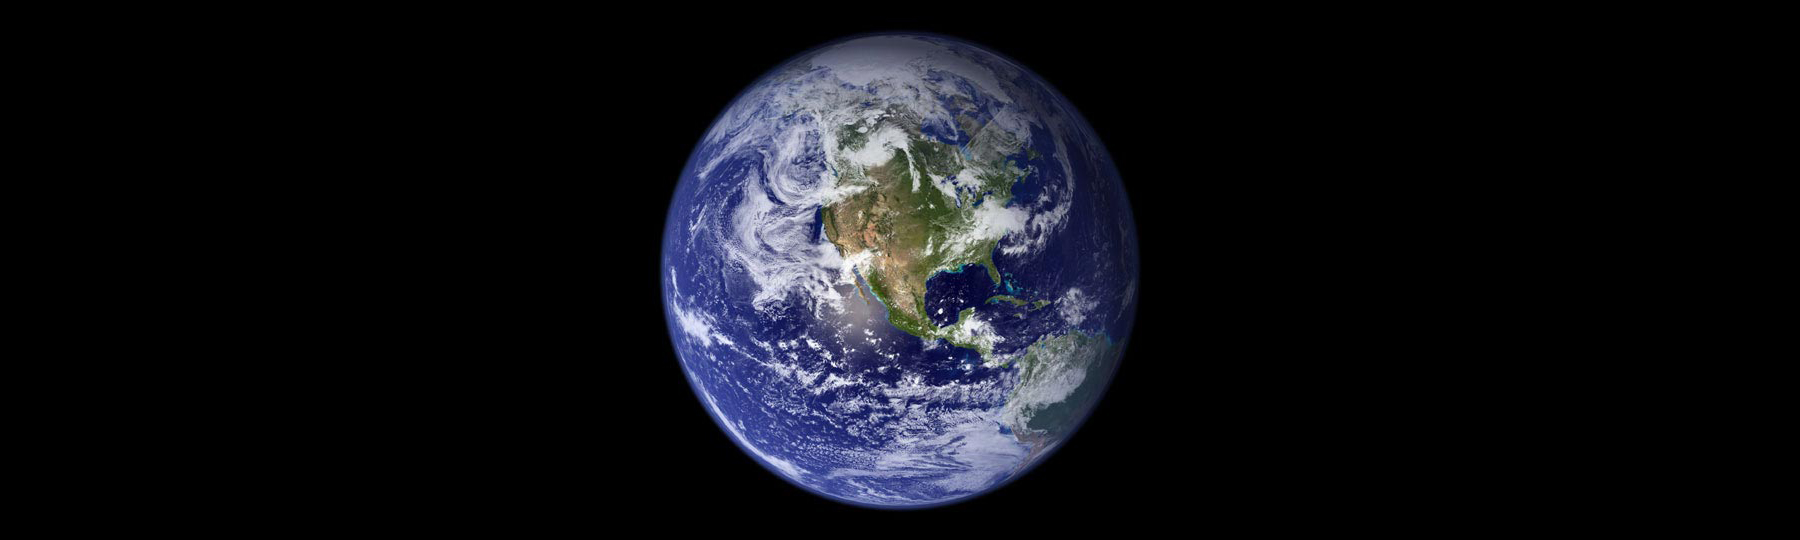 NASA: There is No Asteroid Threatening Earth | NASA